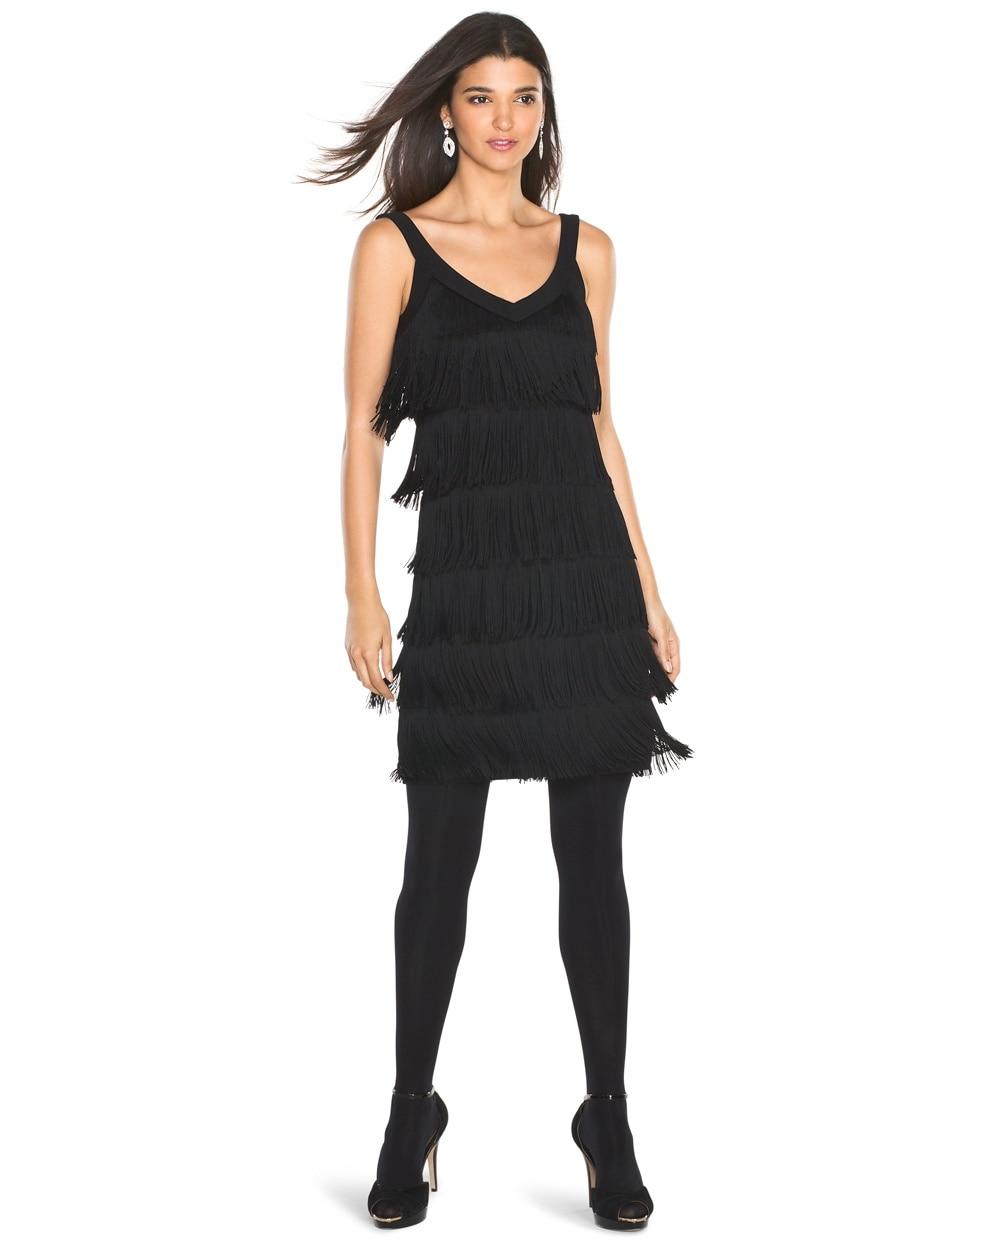 Tiered Fringe Dress White House Black Market